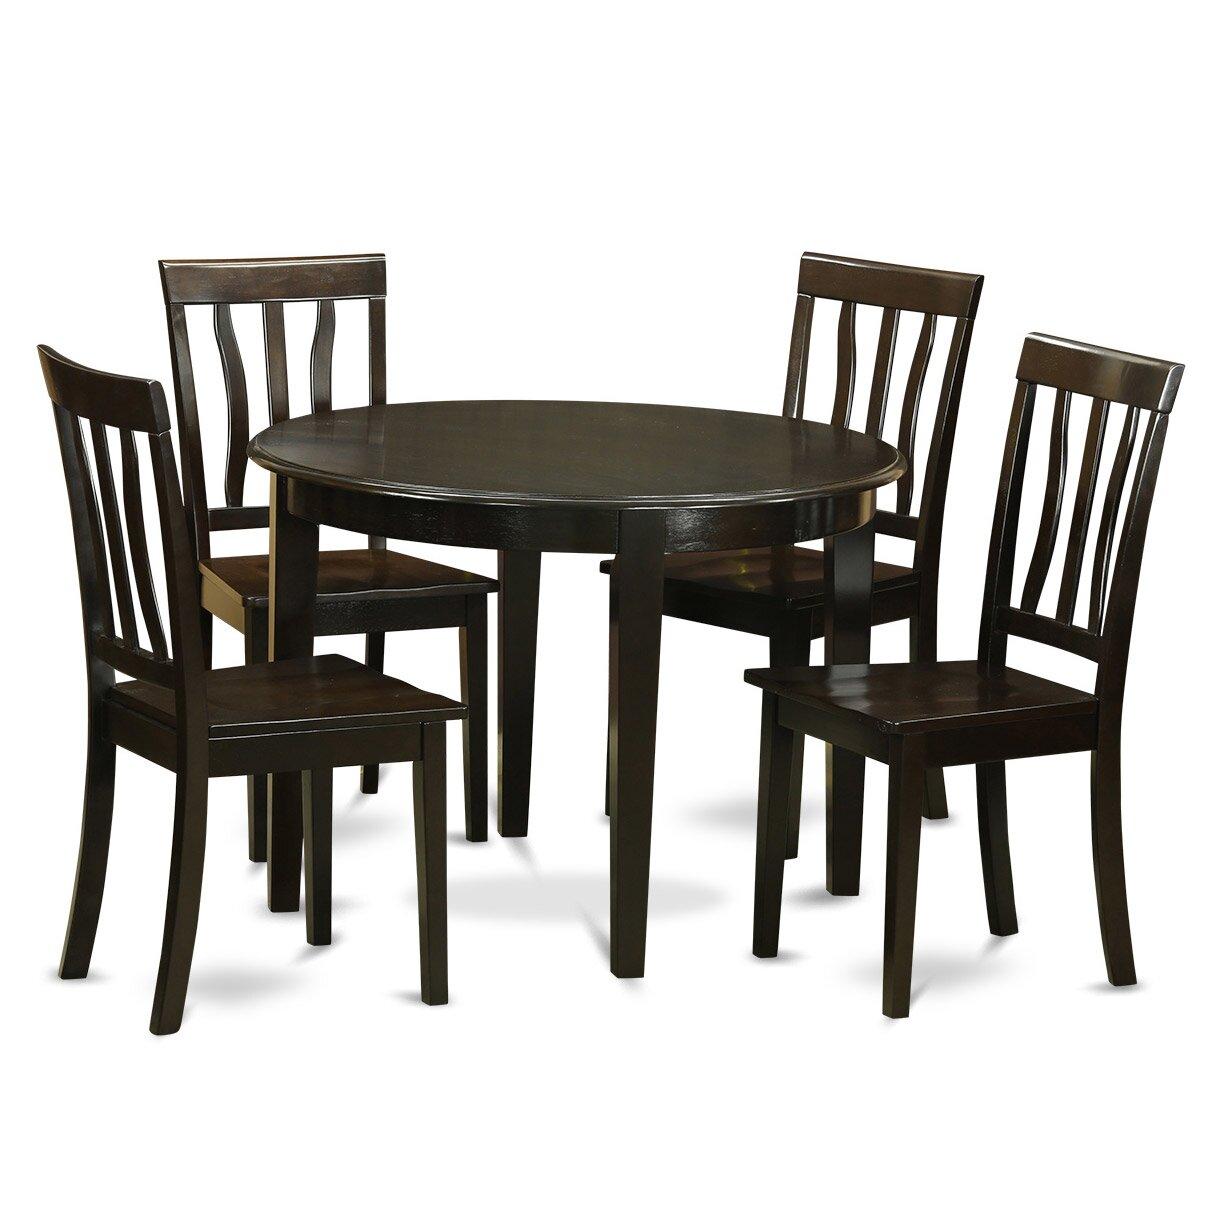 Wooden Importers Lynfield 6 Piece Dining Set: Wooden Importers Boston 5 Piece Dining Set